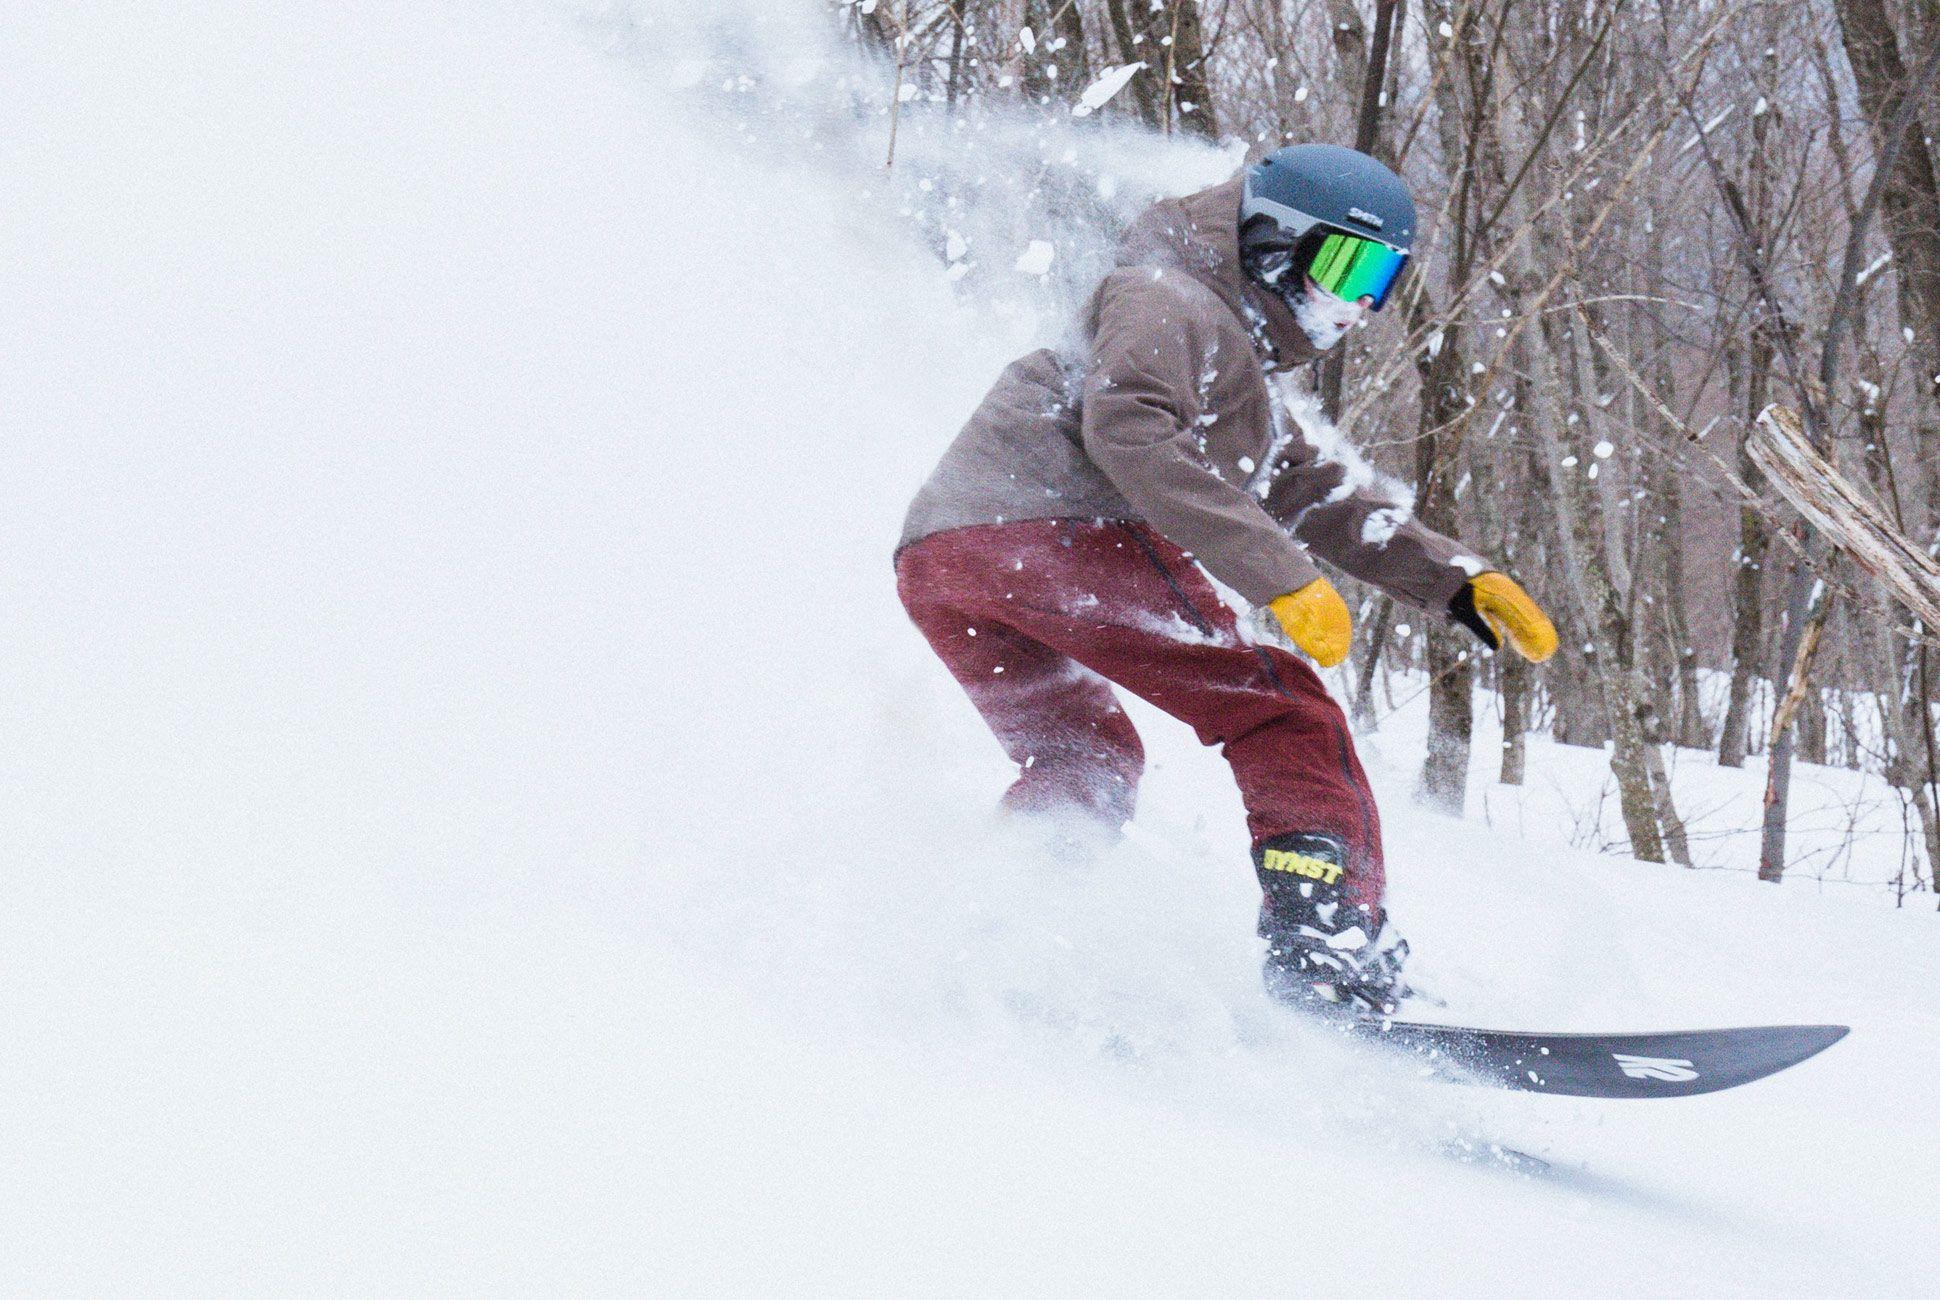 ultimate-ski-and-snow-gear-patrol-stio-slide-2